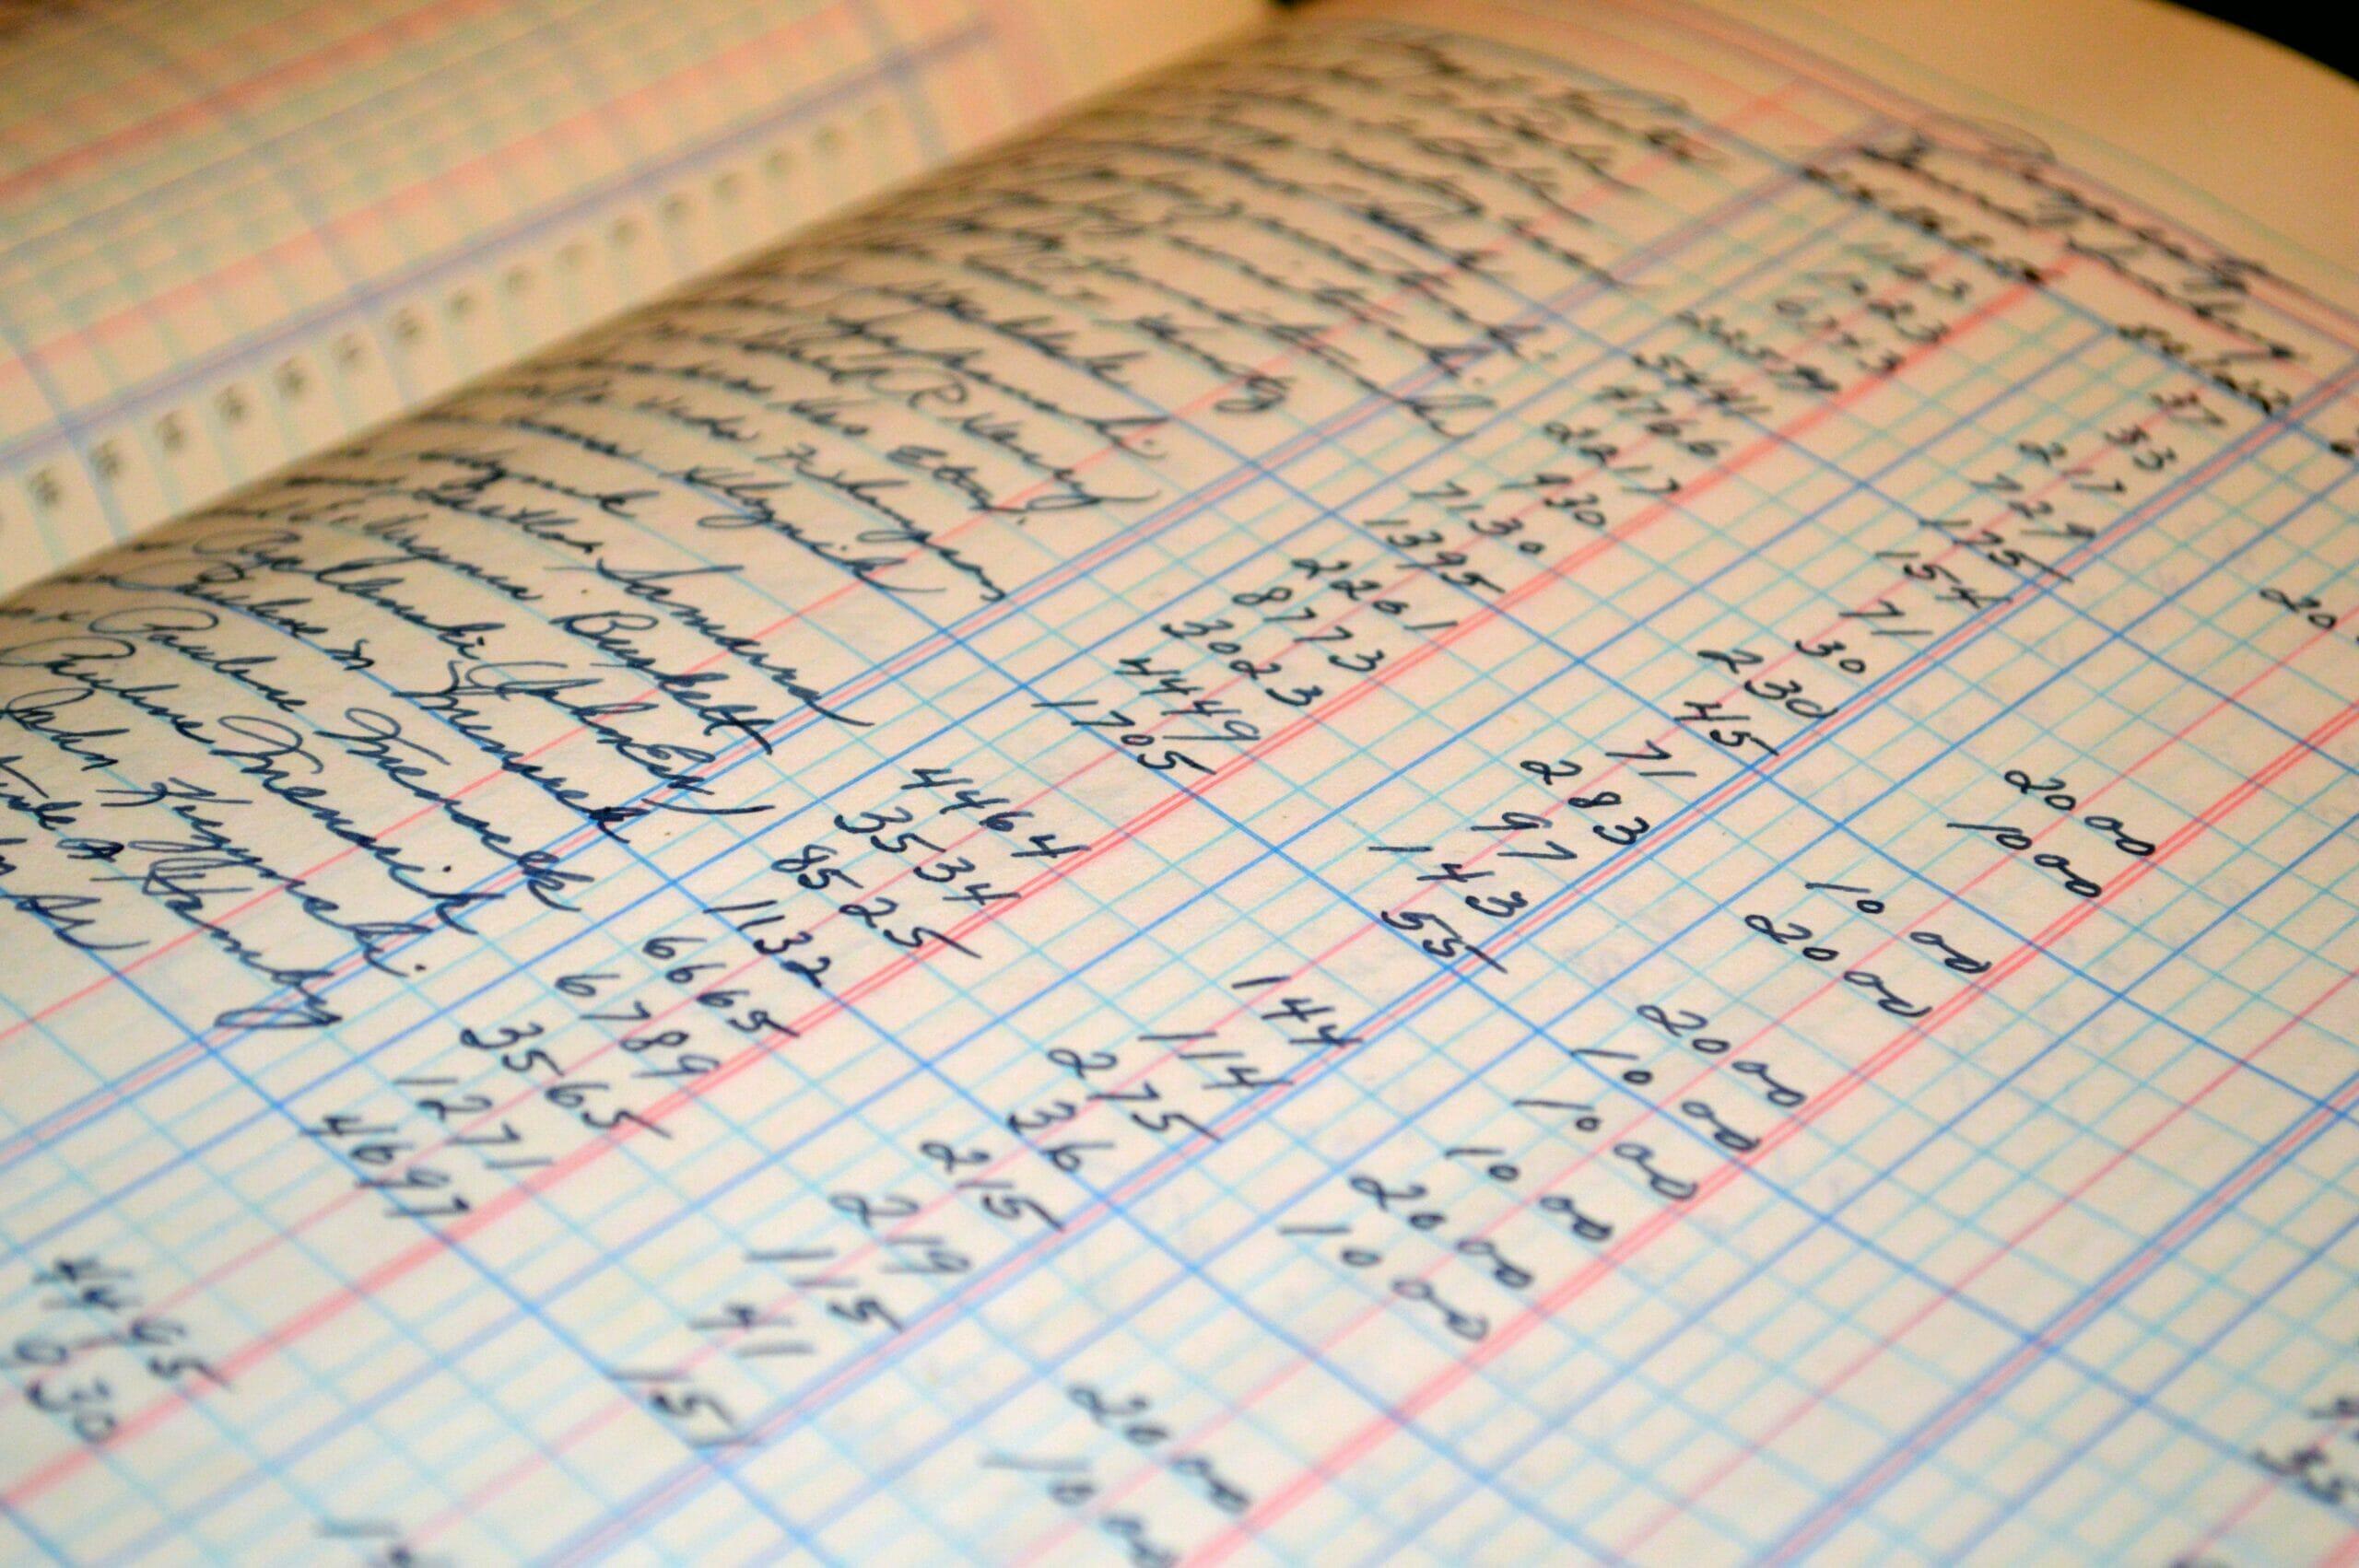 Mesures Covid-19 et imposition internationale